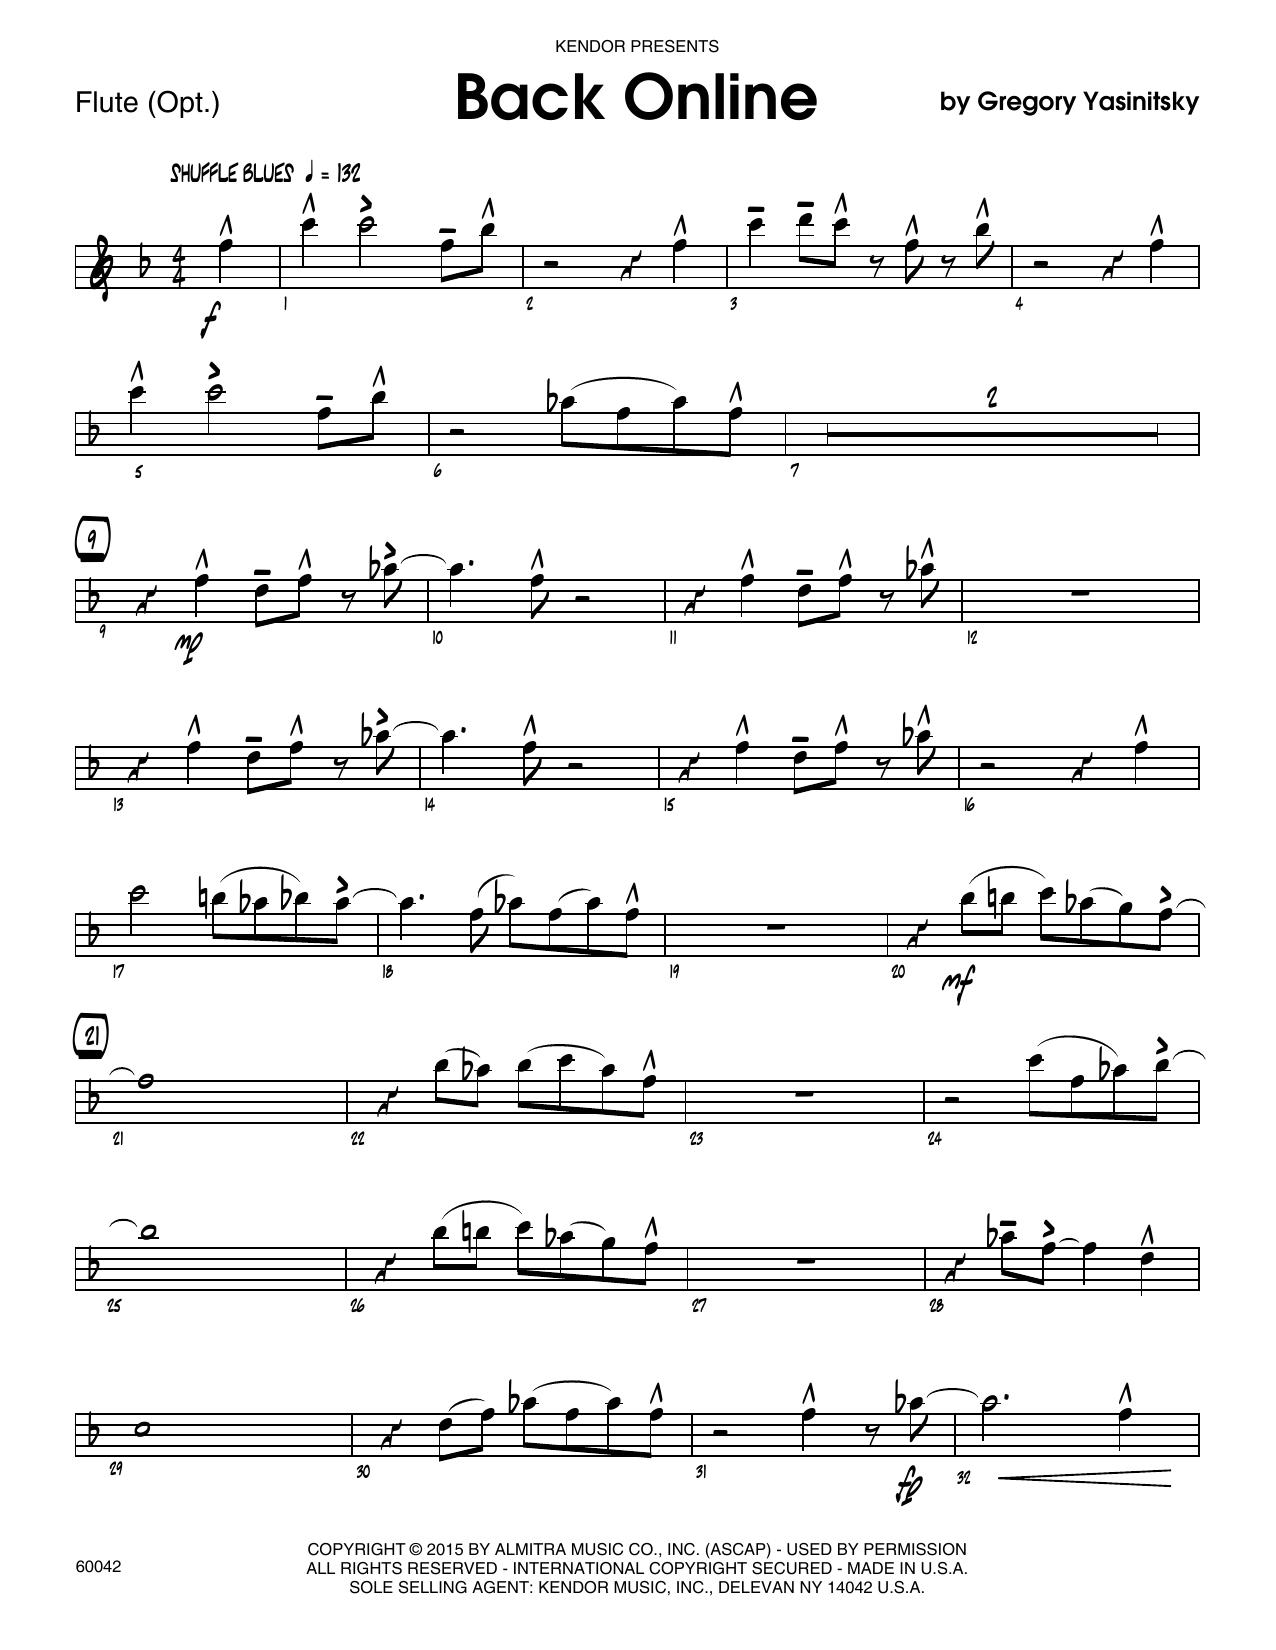 Back Online - Flute Sheet Music